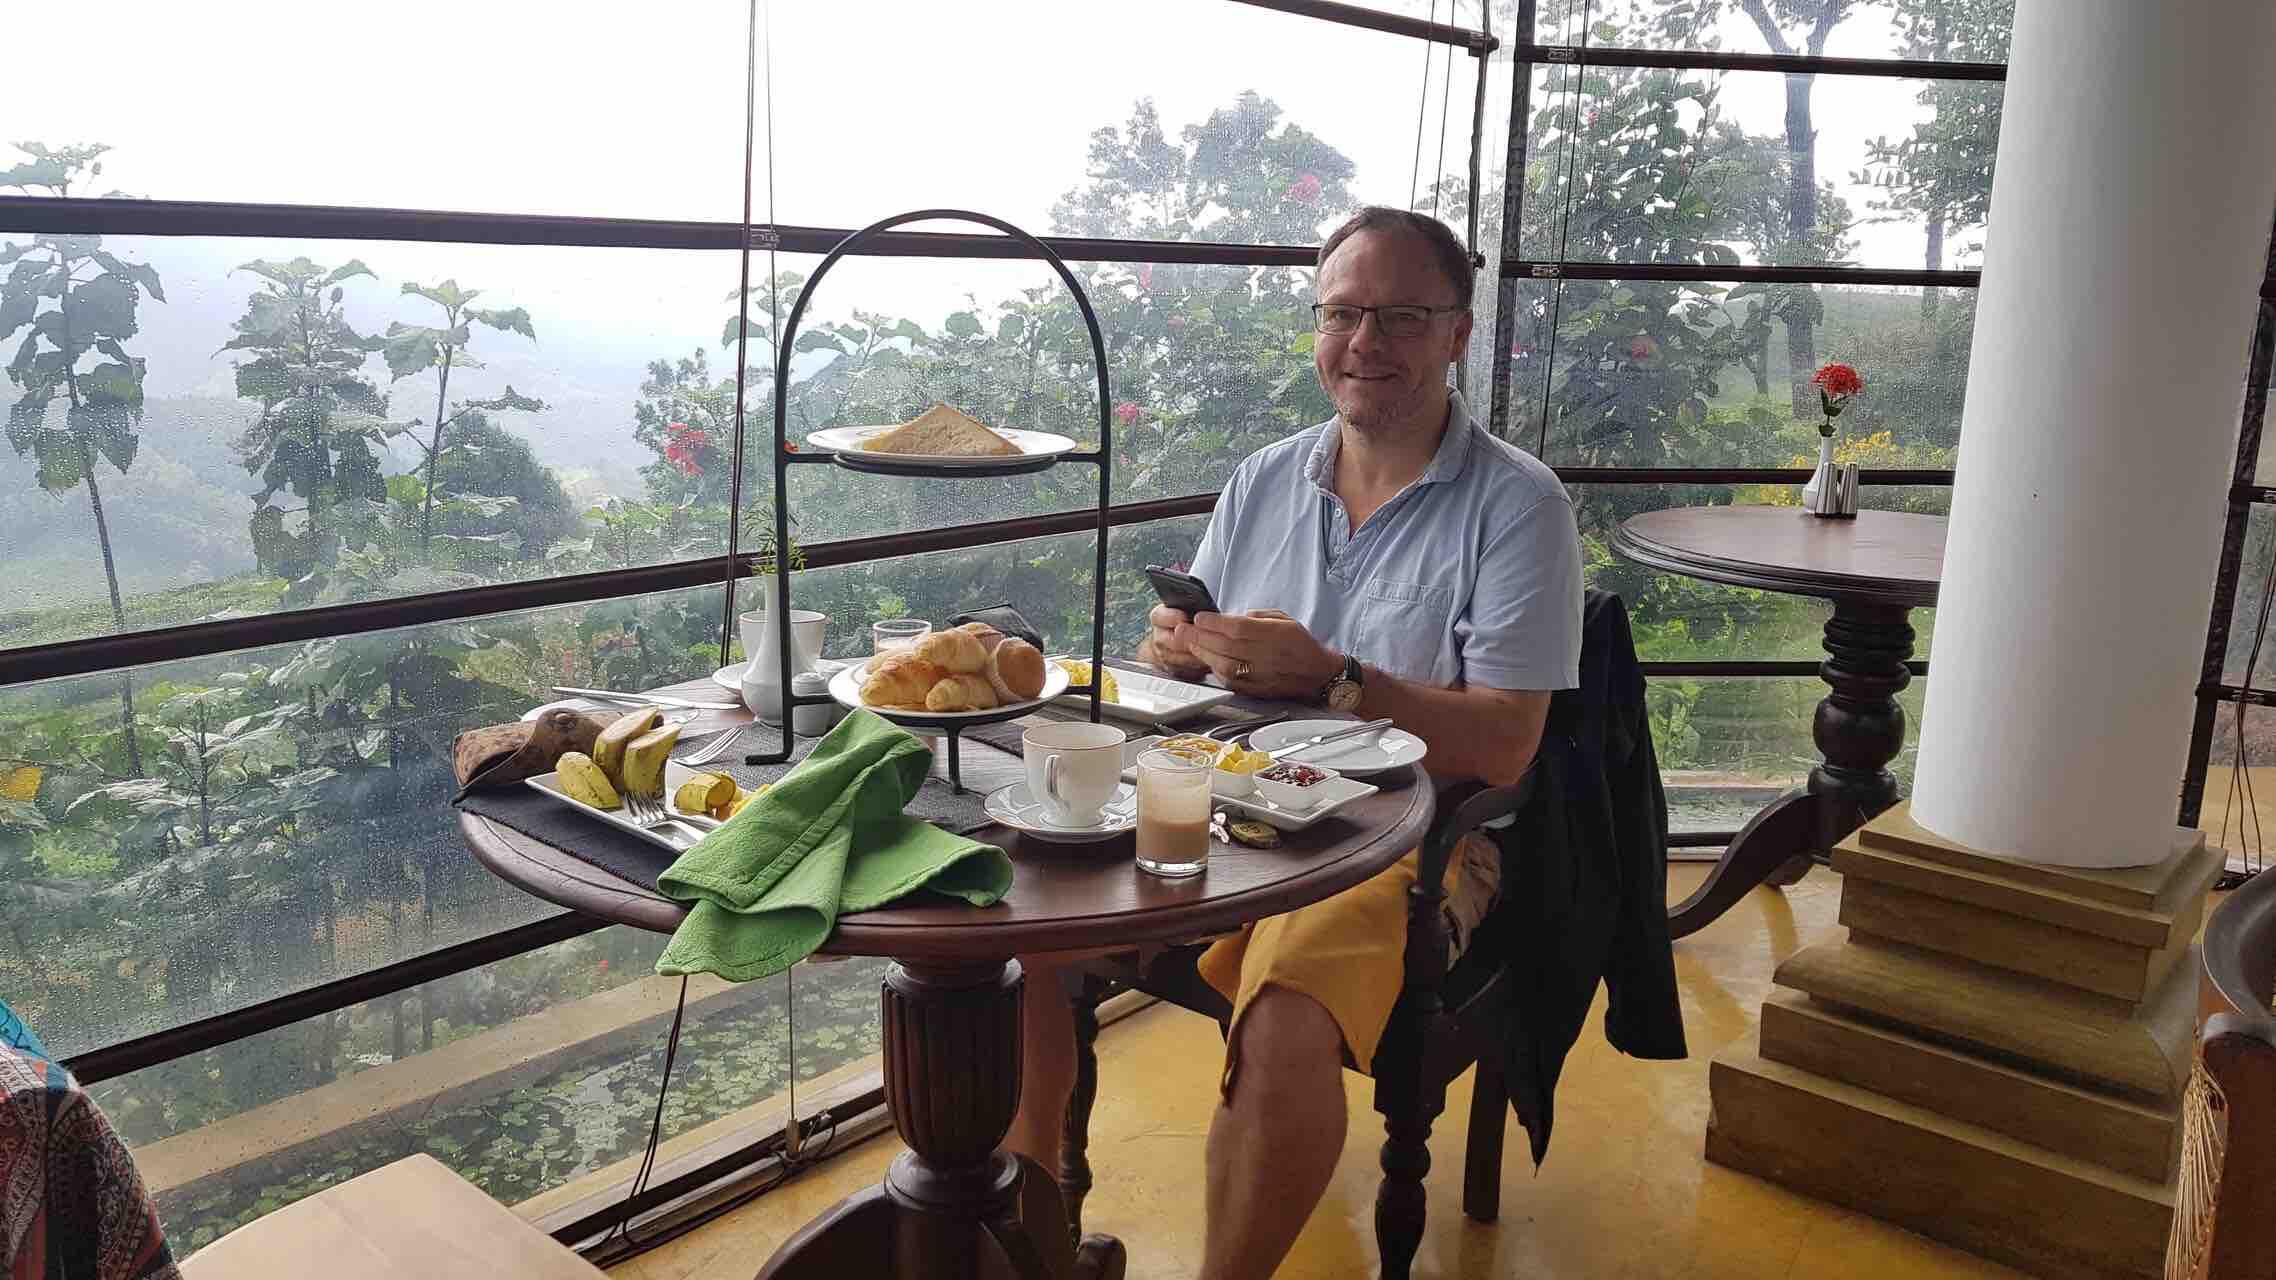 sri-lanka-madulkelle-eco-lodge-restaurant-holiday-review-feedback-invite-to-paradise-quentin-kate-hulm.jpg